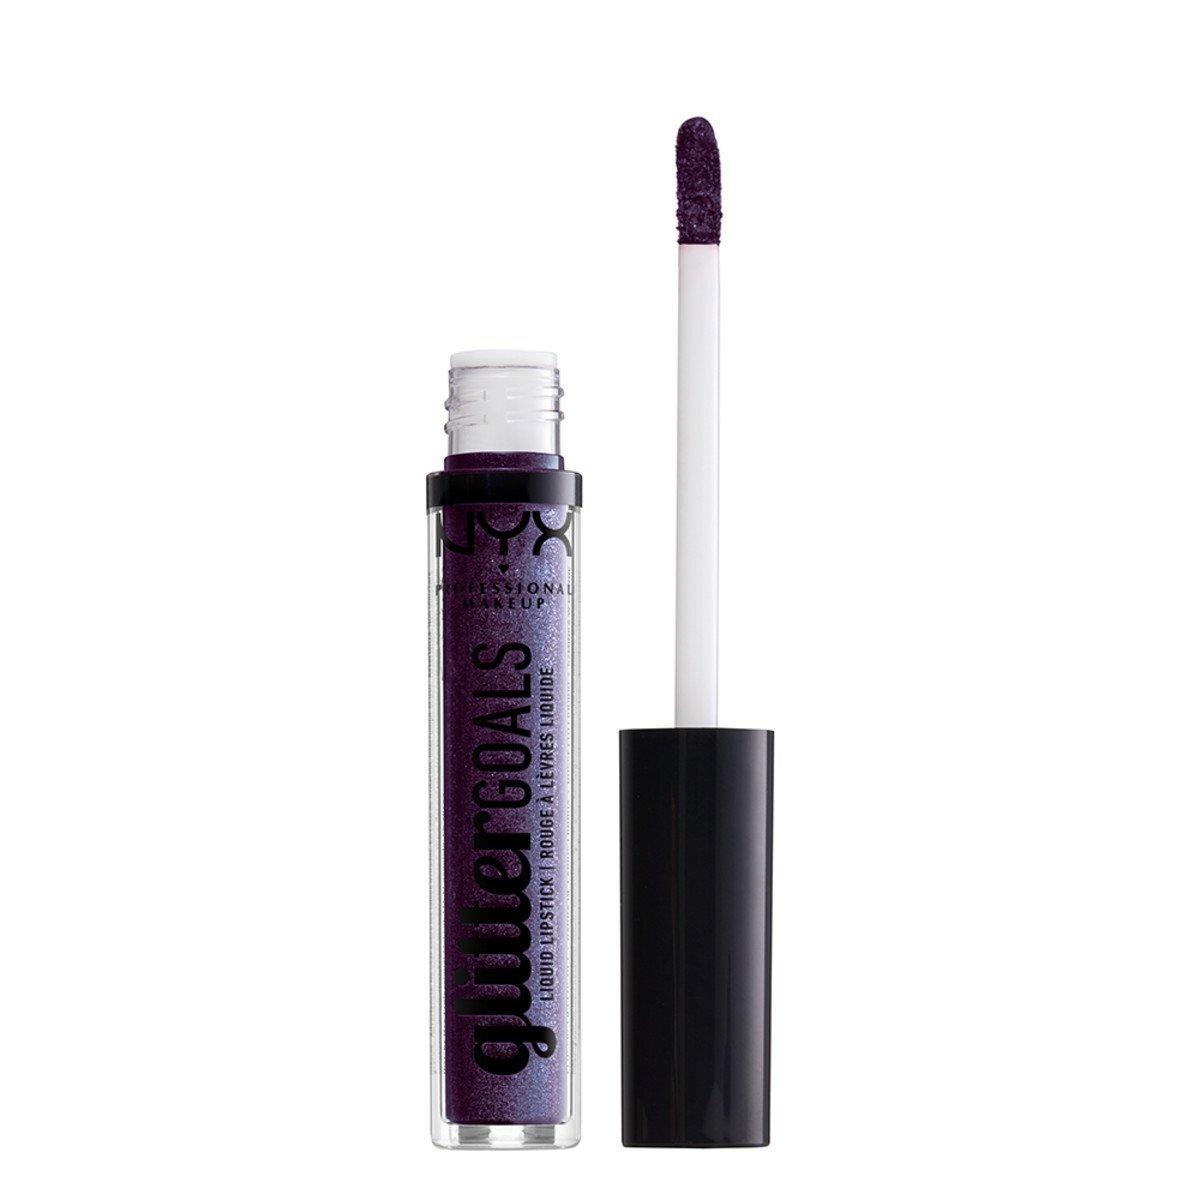 Glitter Goals Liquid Lipstick - Amethyst Vibes